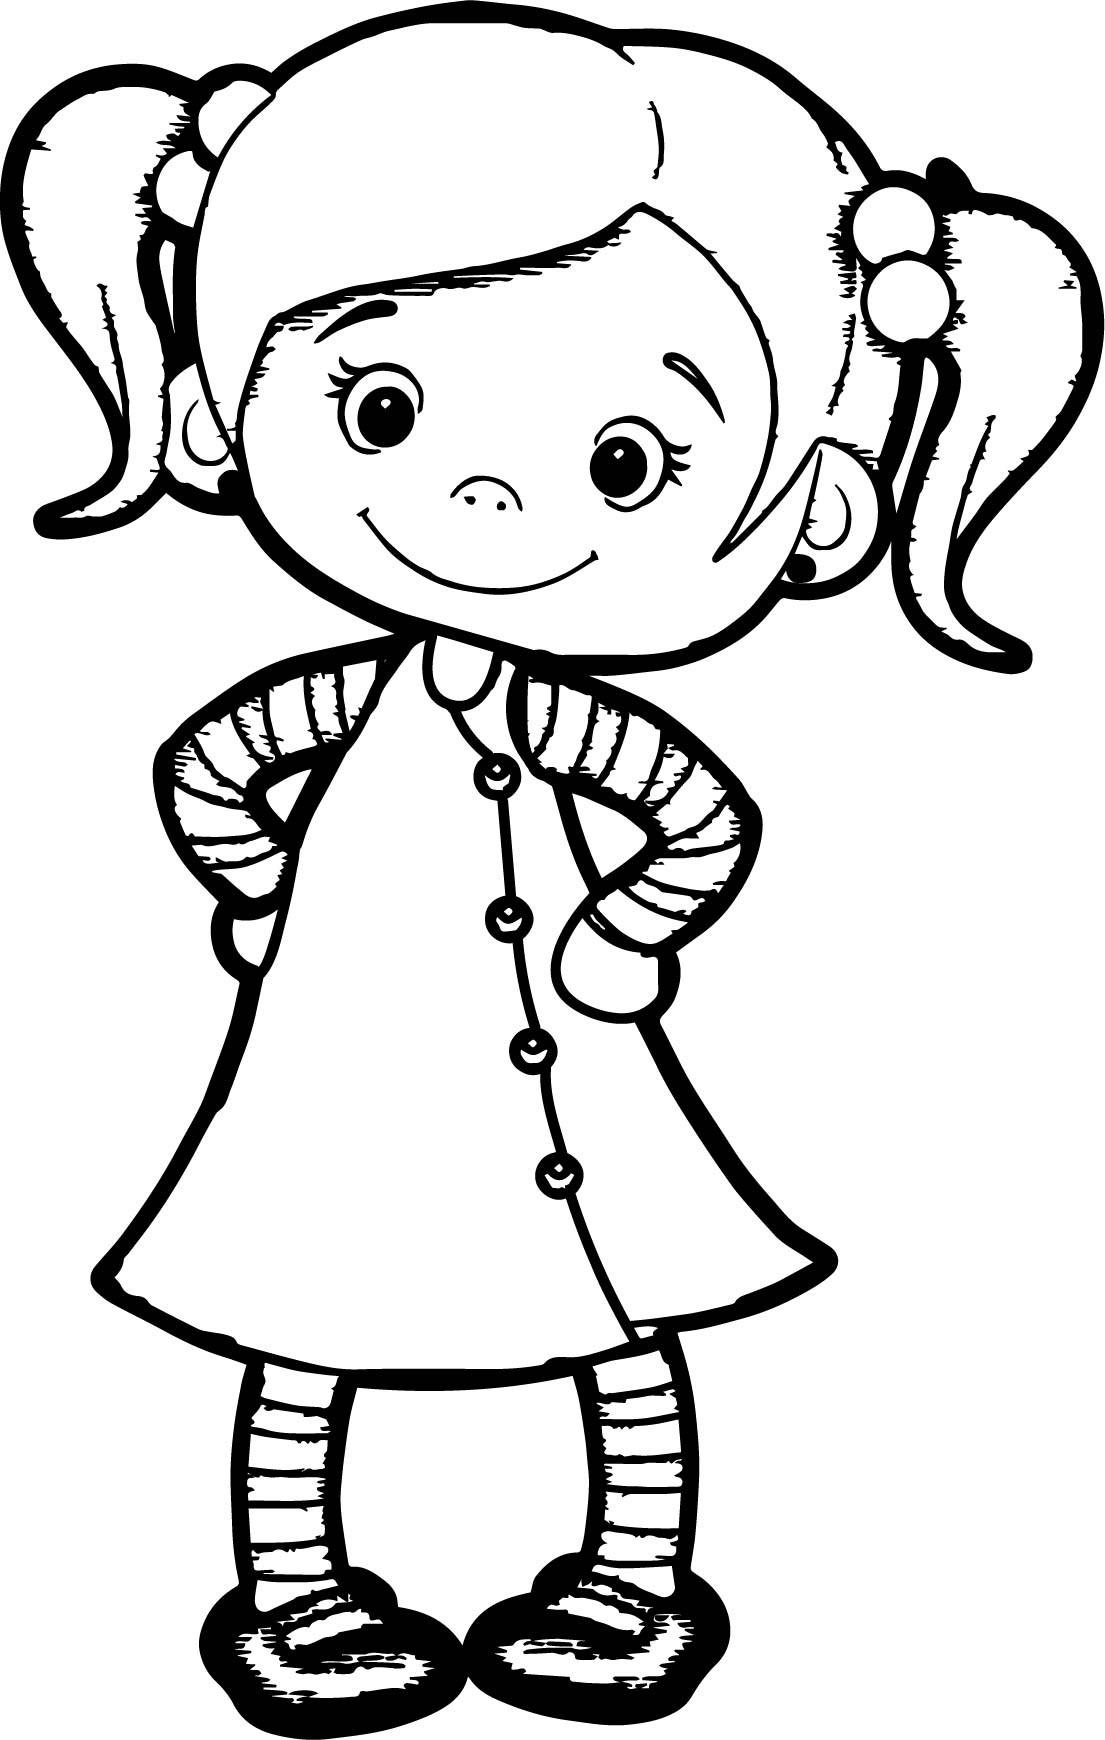 Girl Cartoon Coloring Pages  Cute Girl Cartoon Drawing at GetDrawings